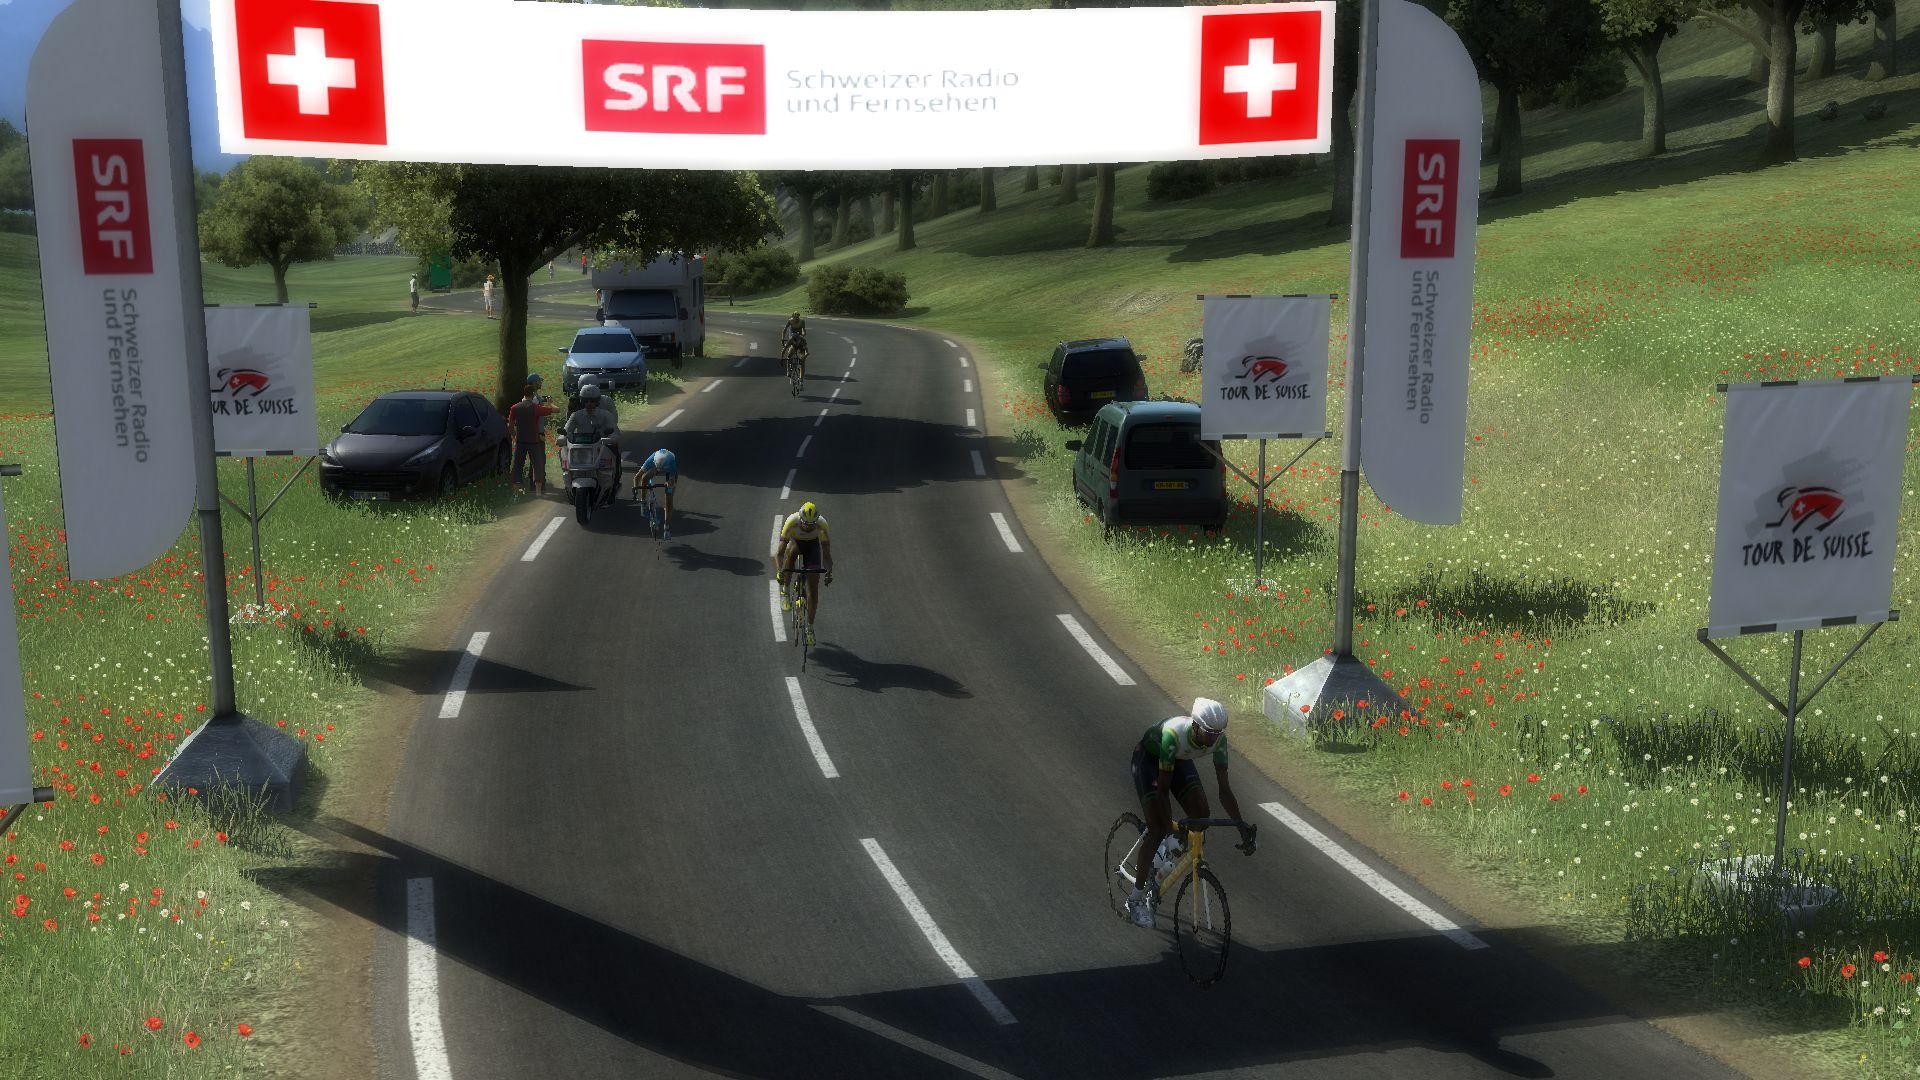 pcmdaily.com/images/mg/2017/Races/U23/Avenir/AVES7%207.jpg